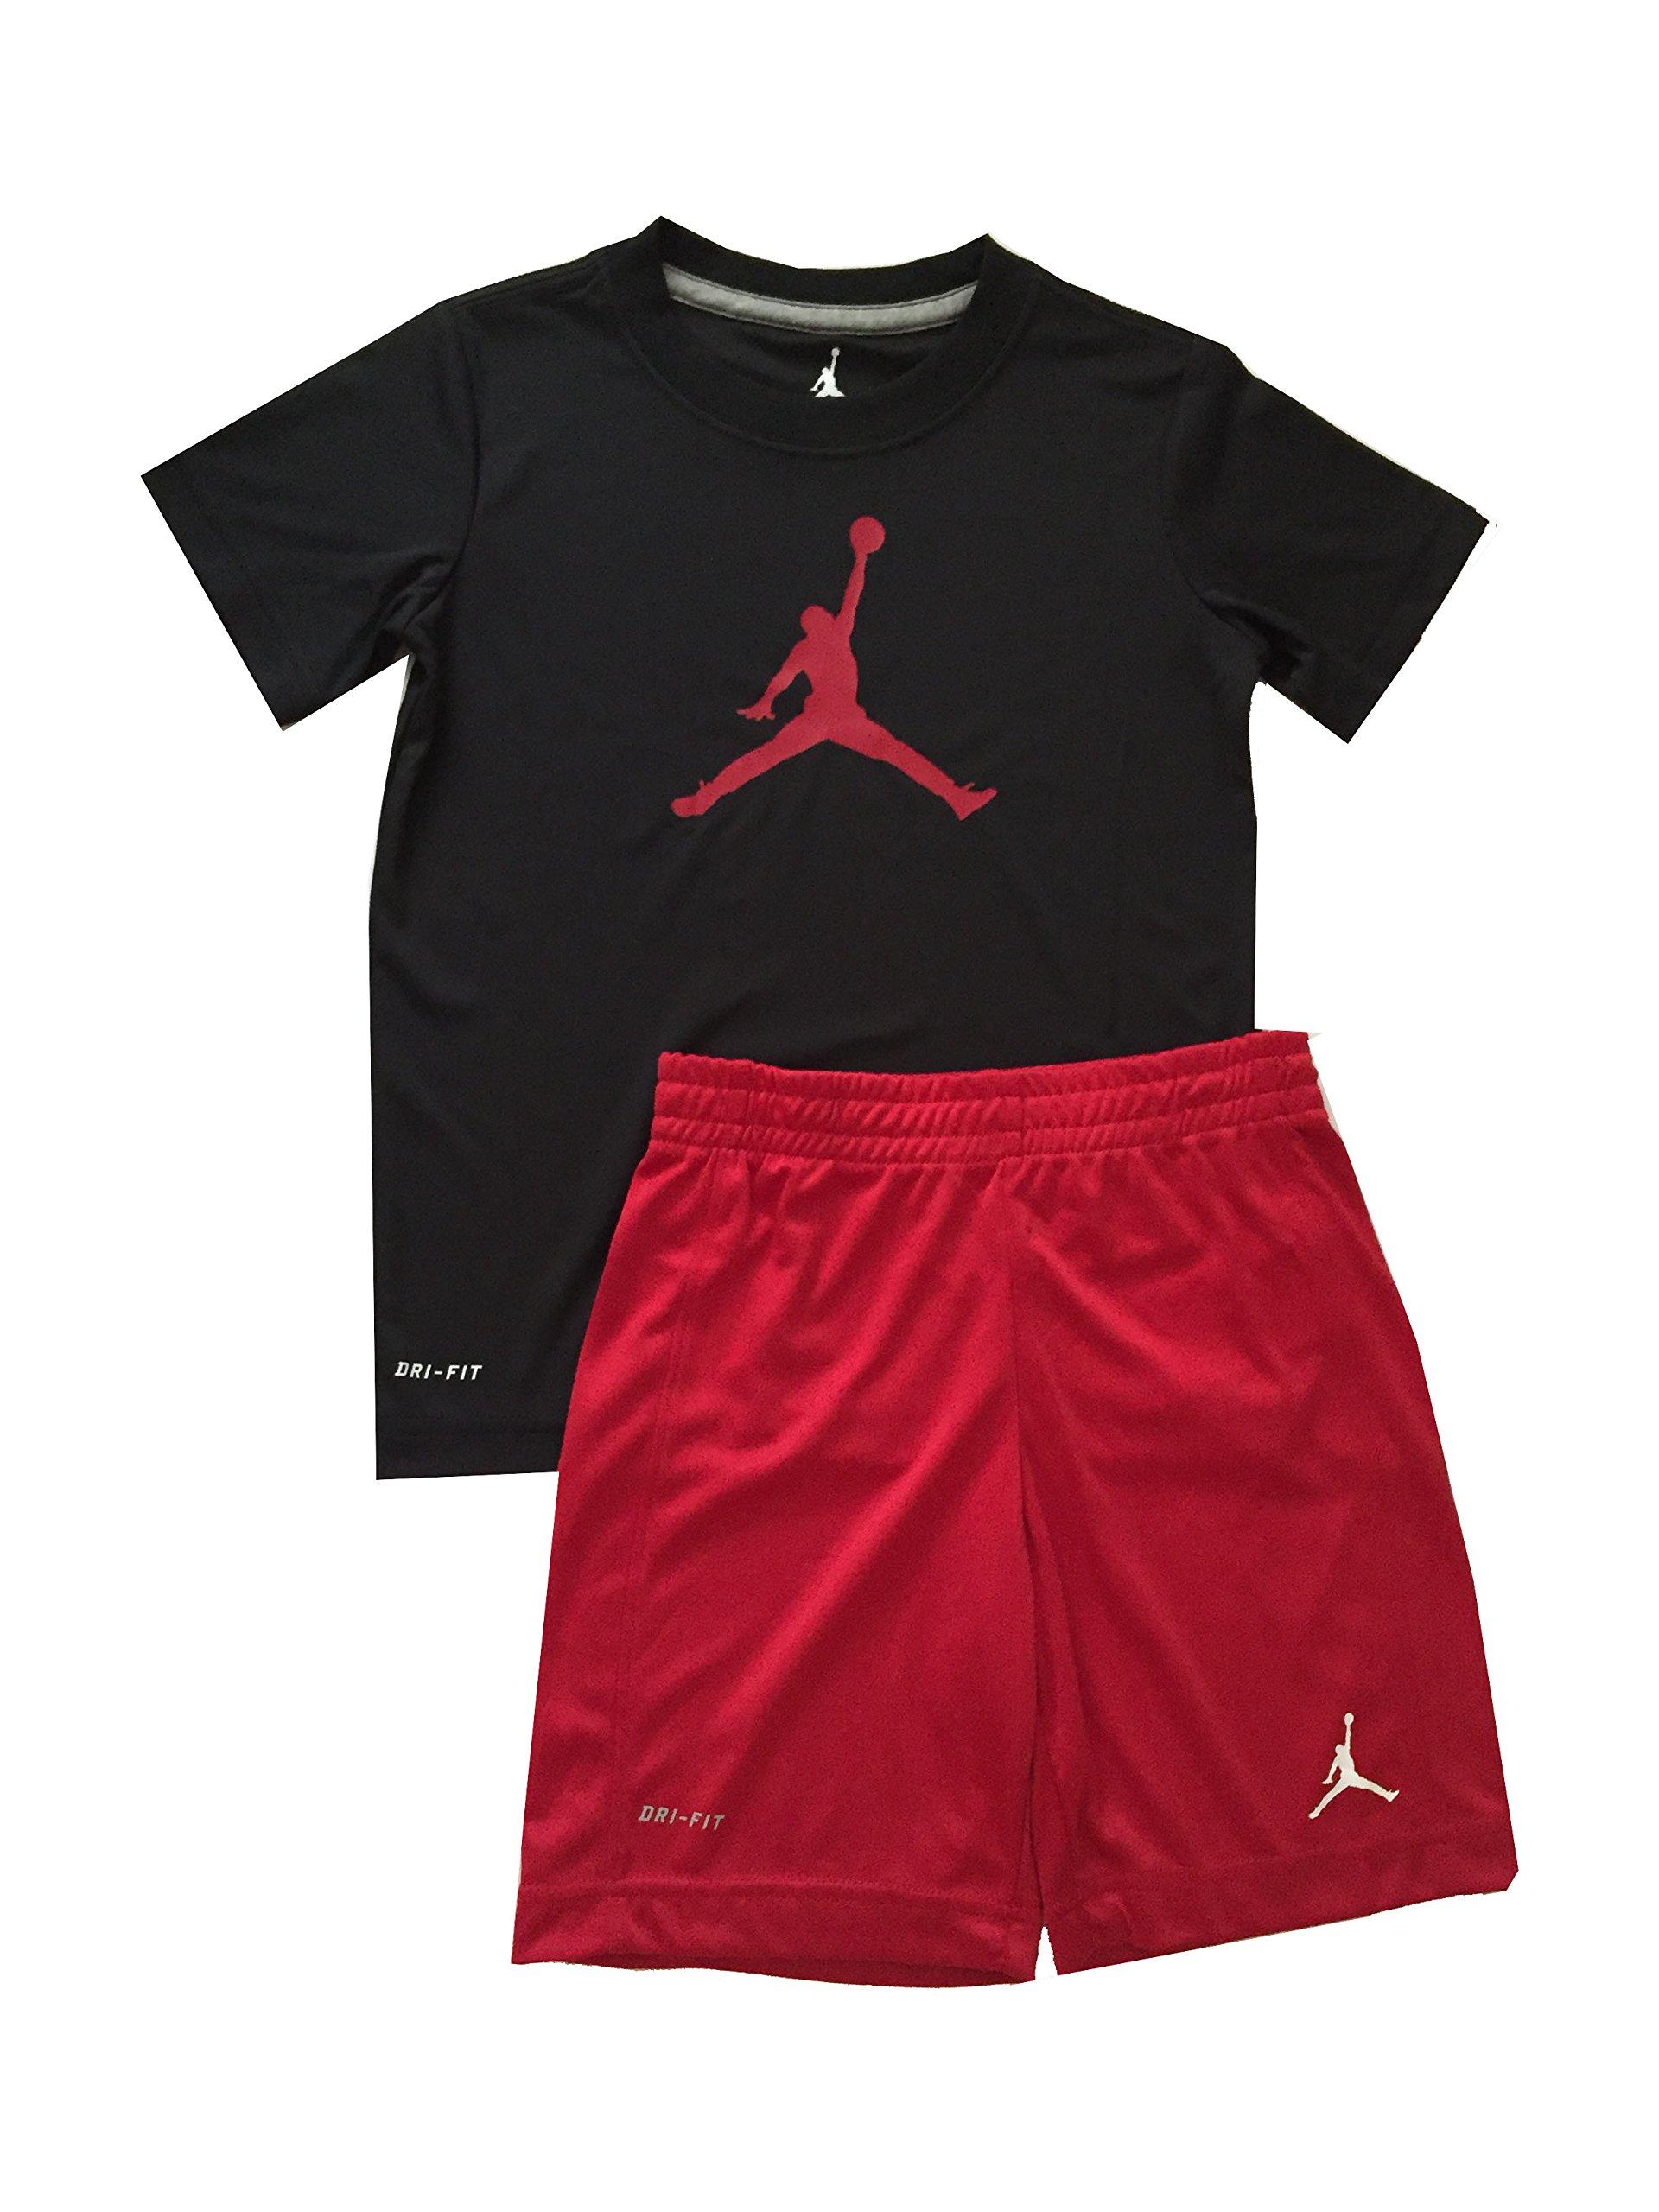 Air Jordan Little Boys Dri-Fit 2 Piece Tee Shirt and Shorts Set Gym Red/Black Size 4